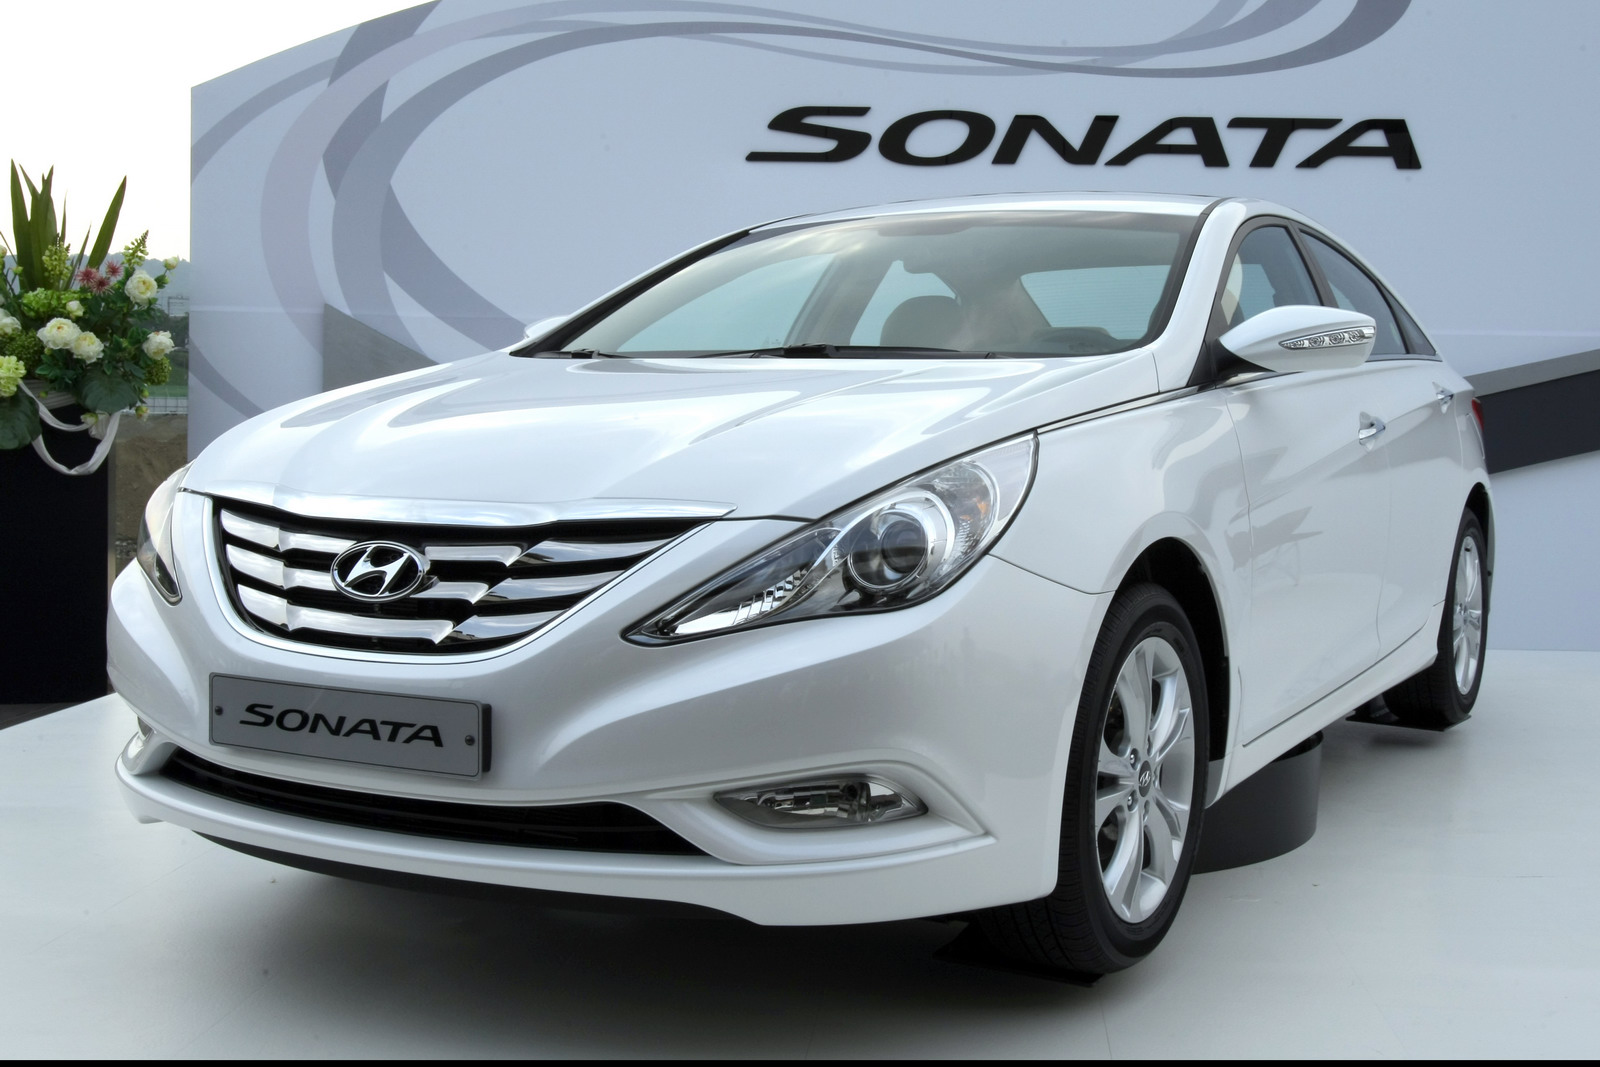 2011 hyundai sonata well turned cars 2011 hyundai sonata. Black Bedroom Furniture Sets. Home Design Ideas